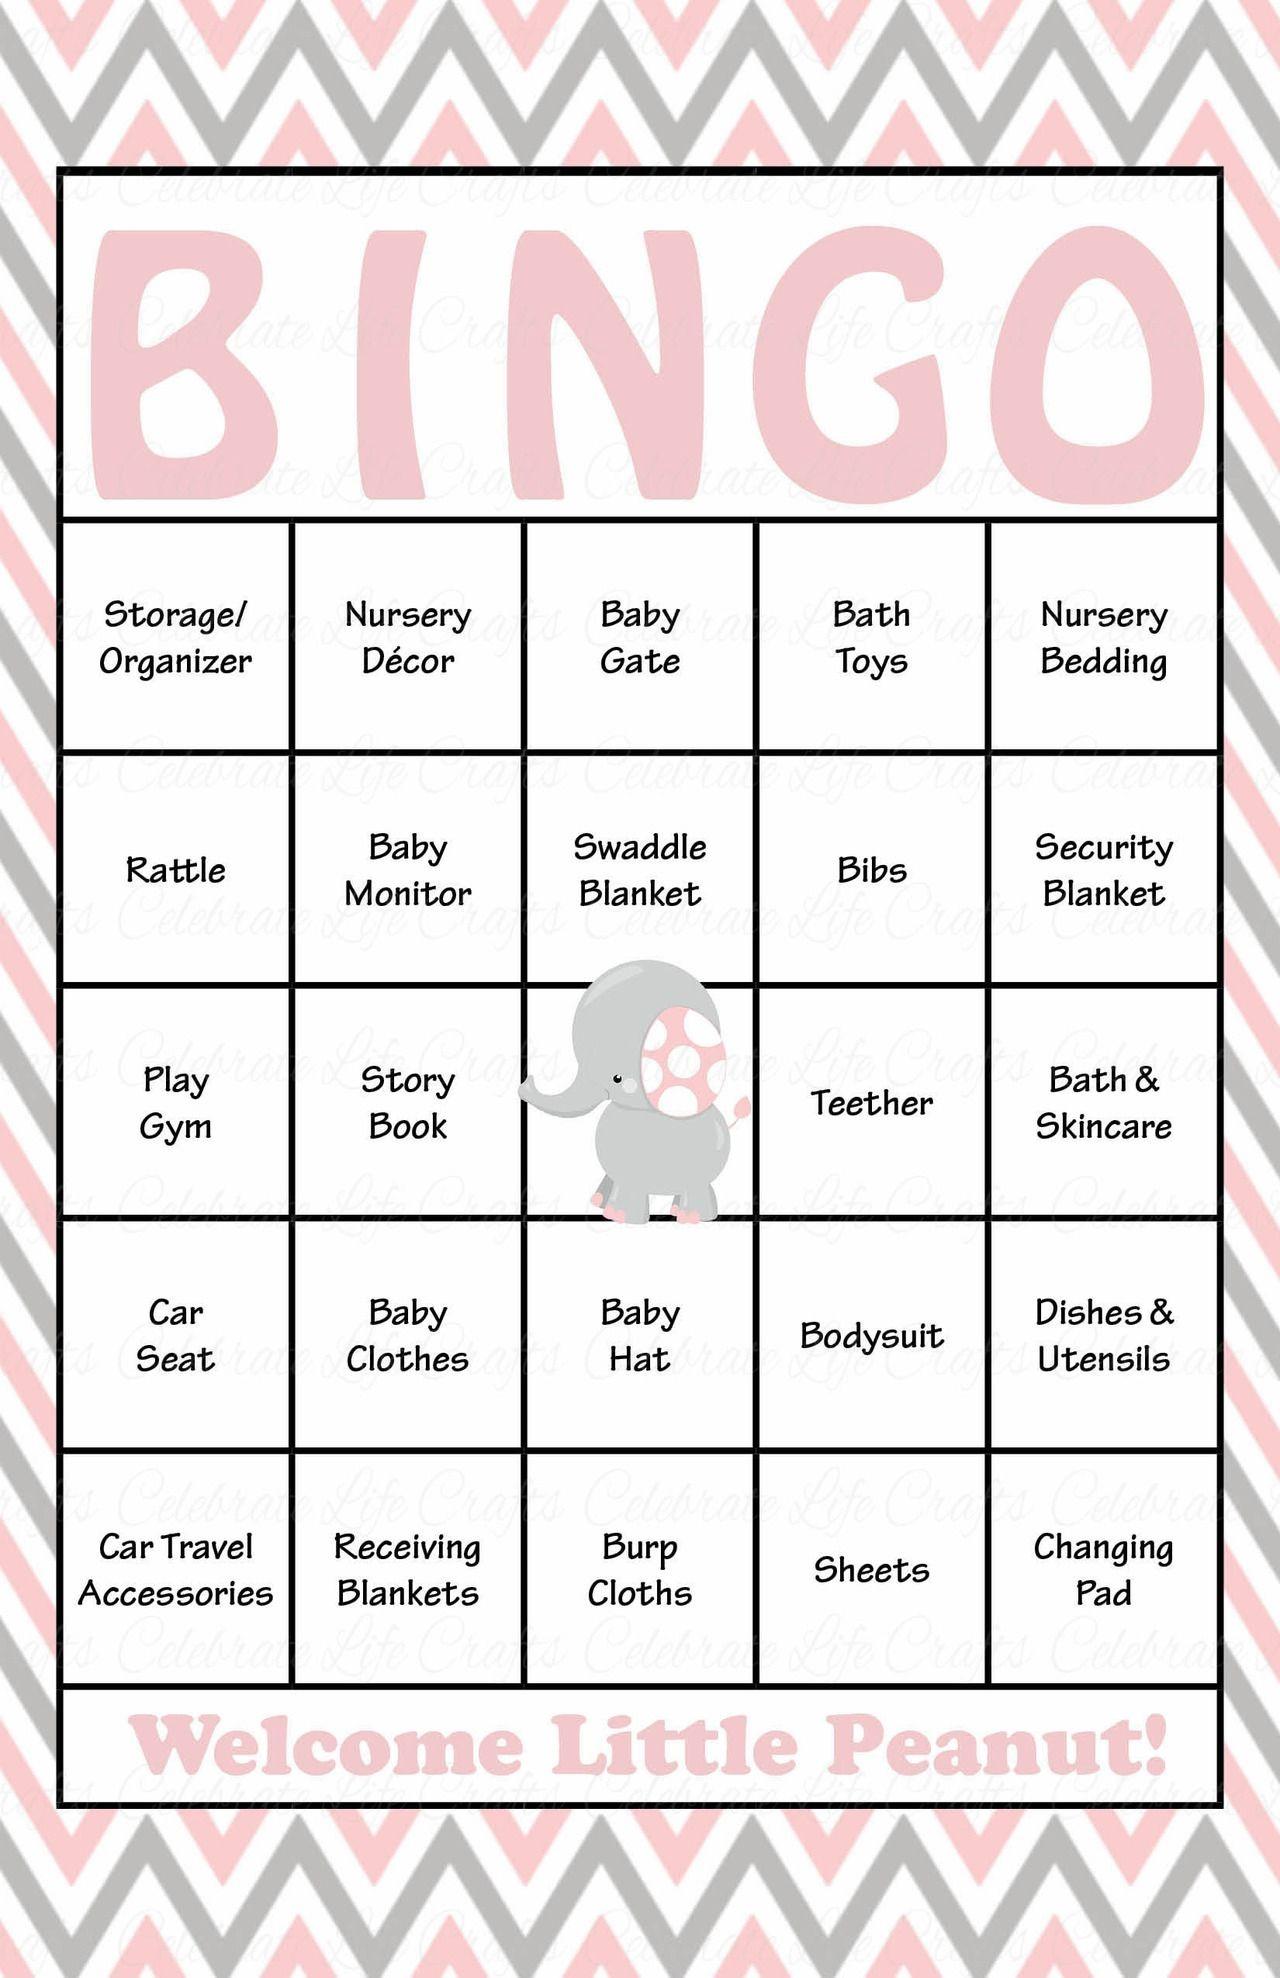 Elephant Baby Shower - Baby Bingo Cards - Printable Download - Baby - Baby Bingo Free Printable